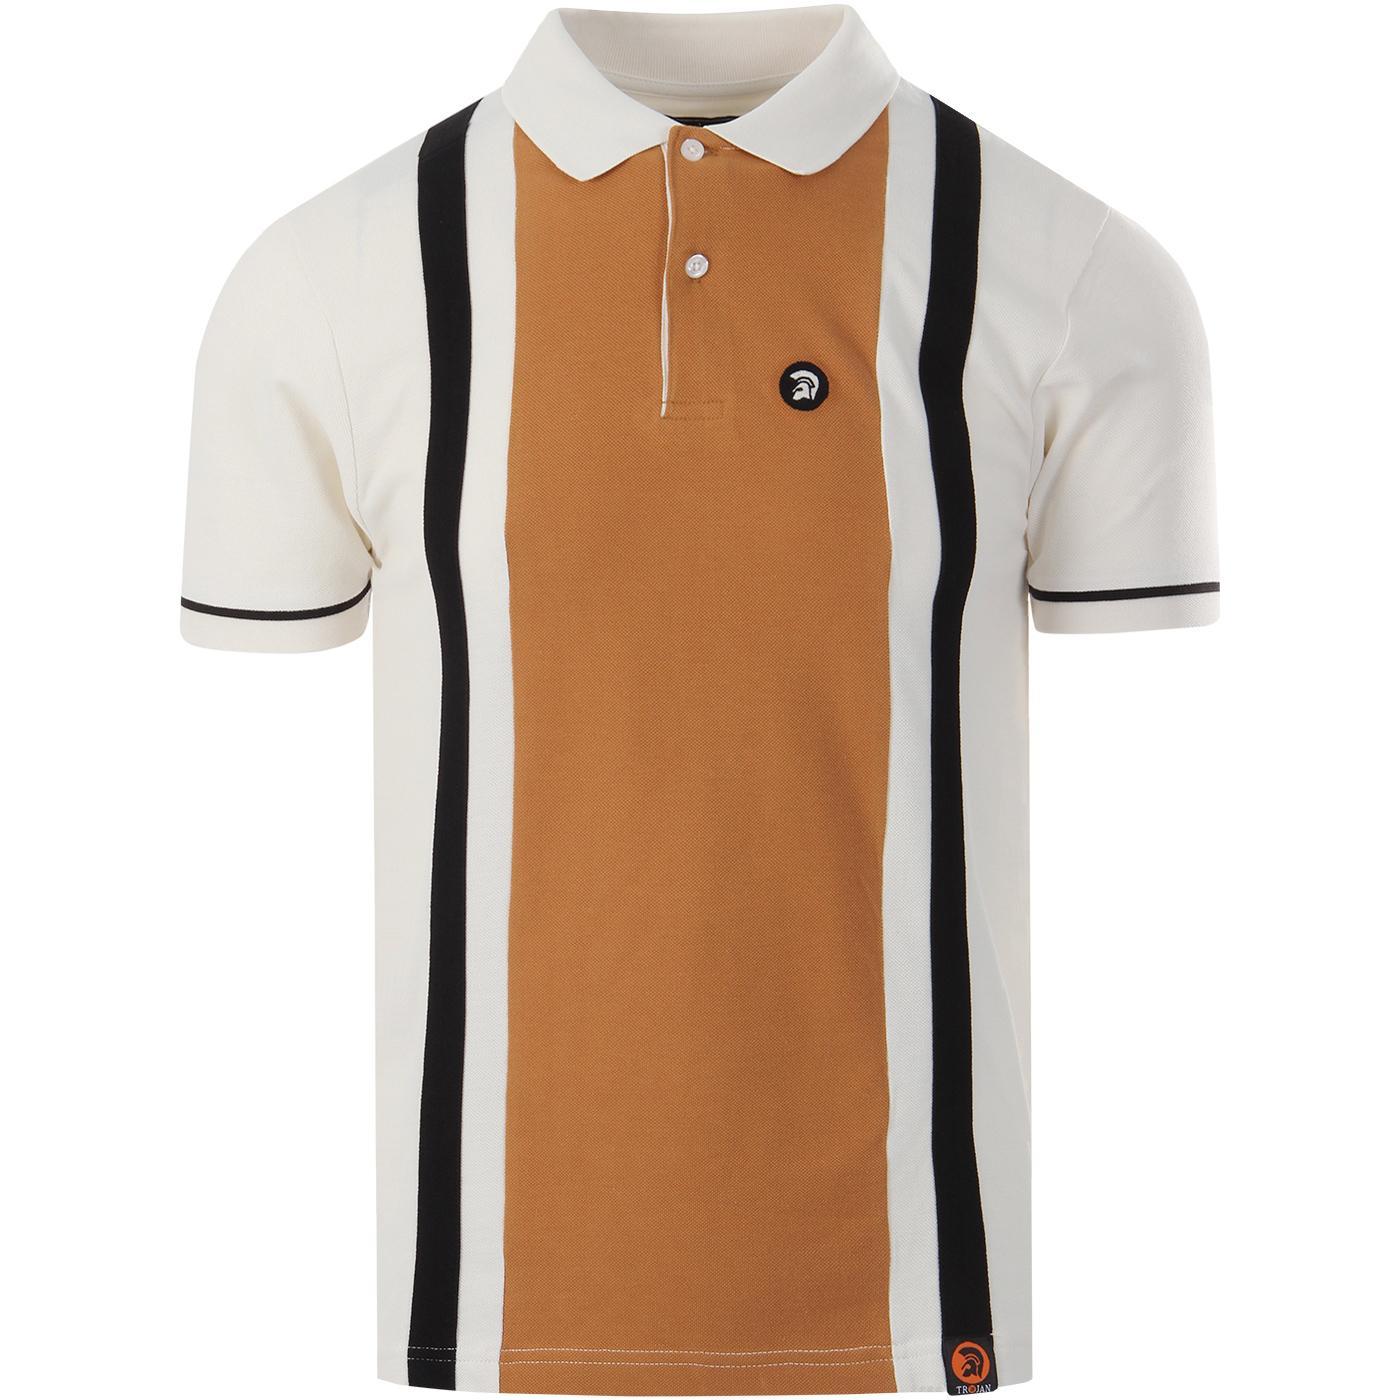 TROJAN RECORDS Retro Mod Pique Panel Polo Shirt E